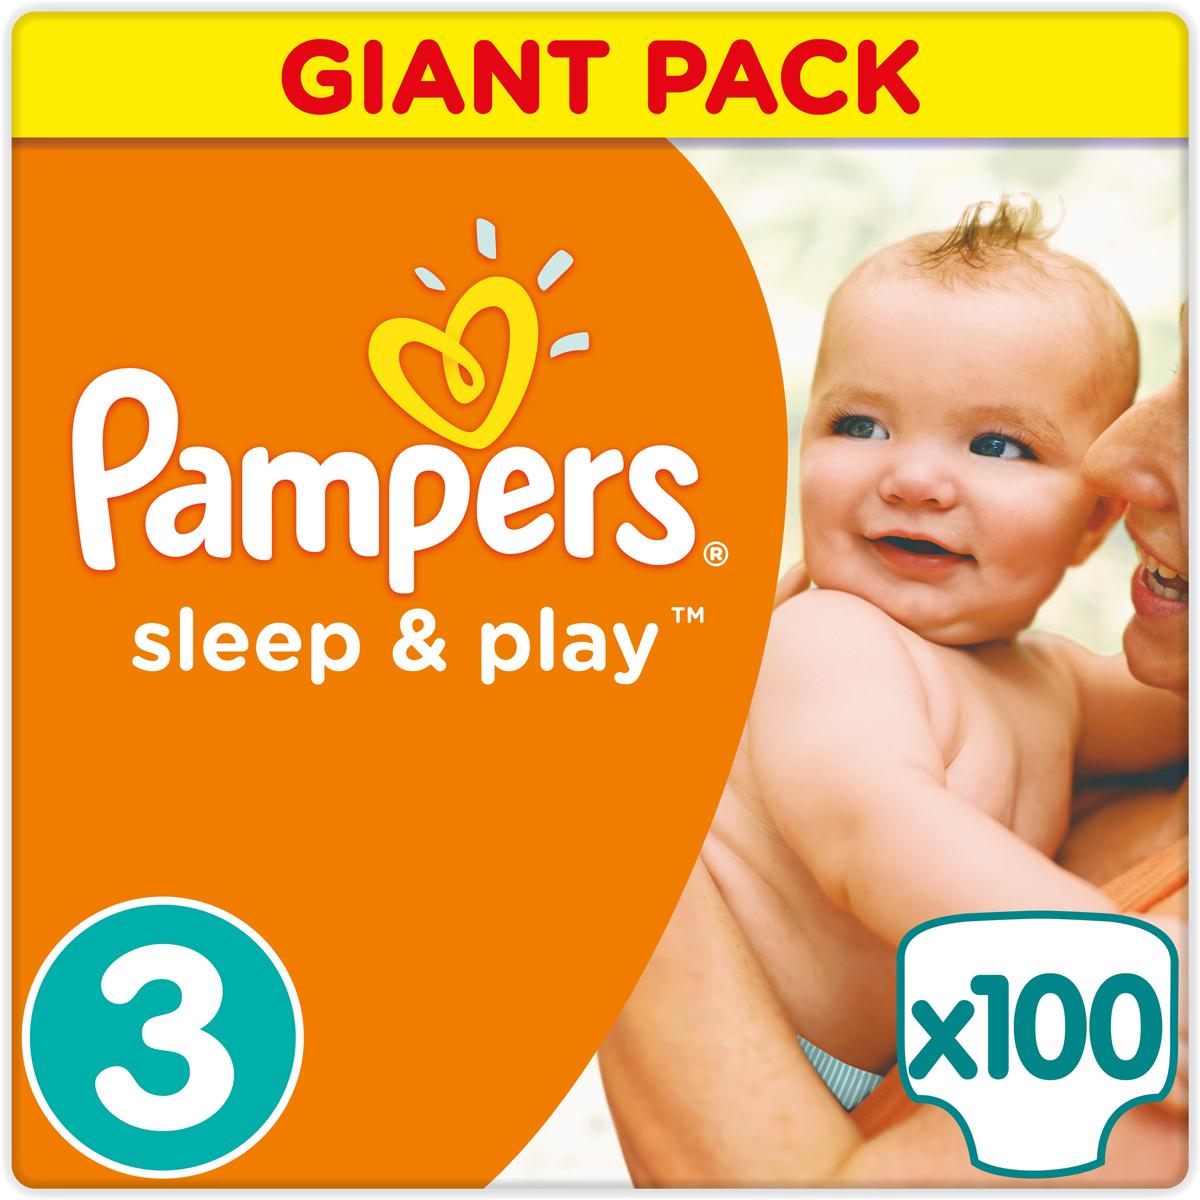 Pampers Подгузники Sleep & Play 5-9 кг (размер 3) 100 шт - Подгузники и пеленки